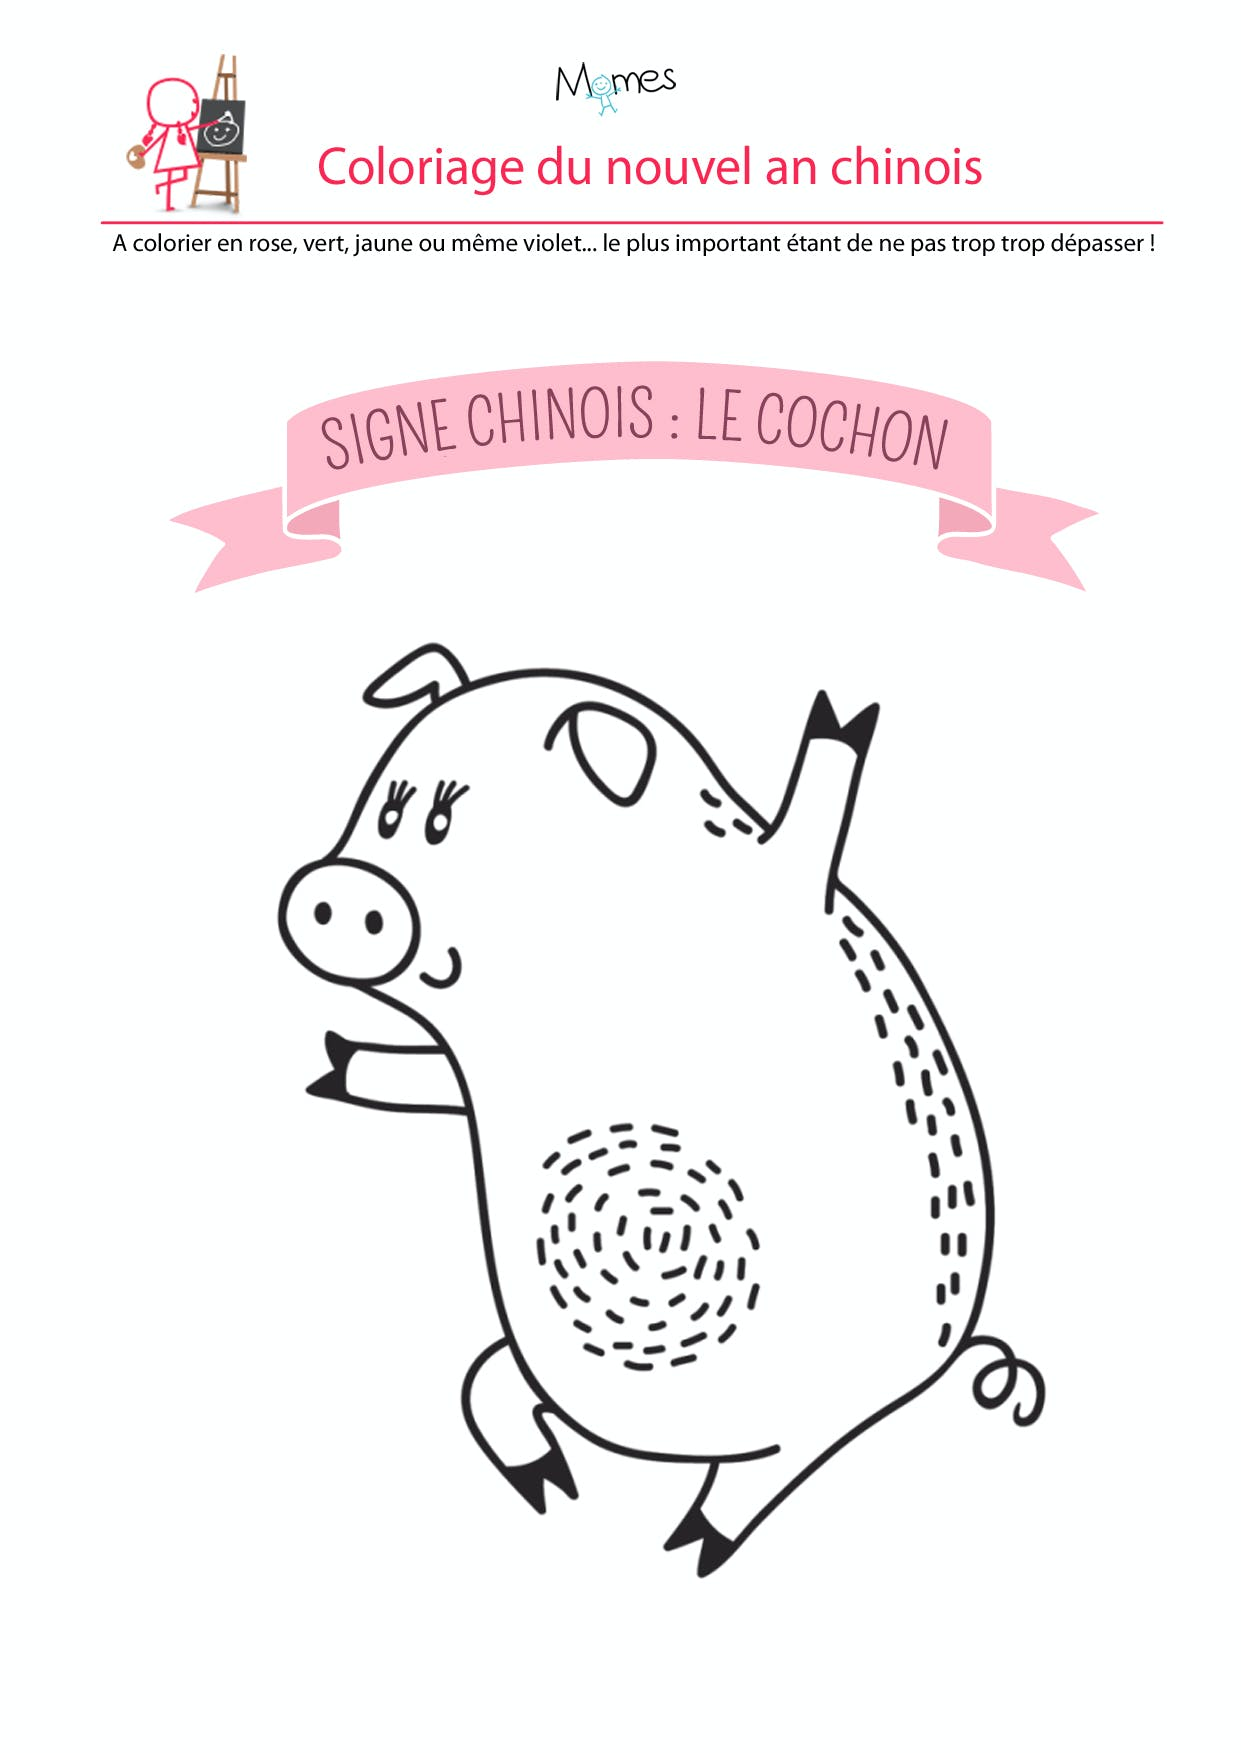 Coloriage du calendrier chinois : le cochon - Momes.net